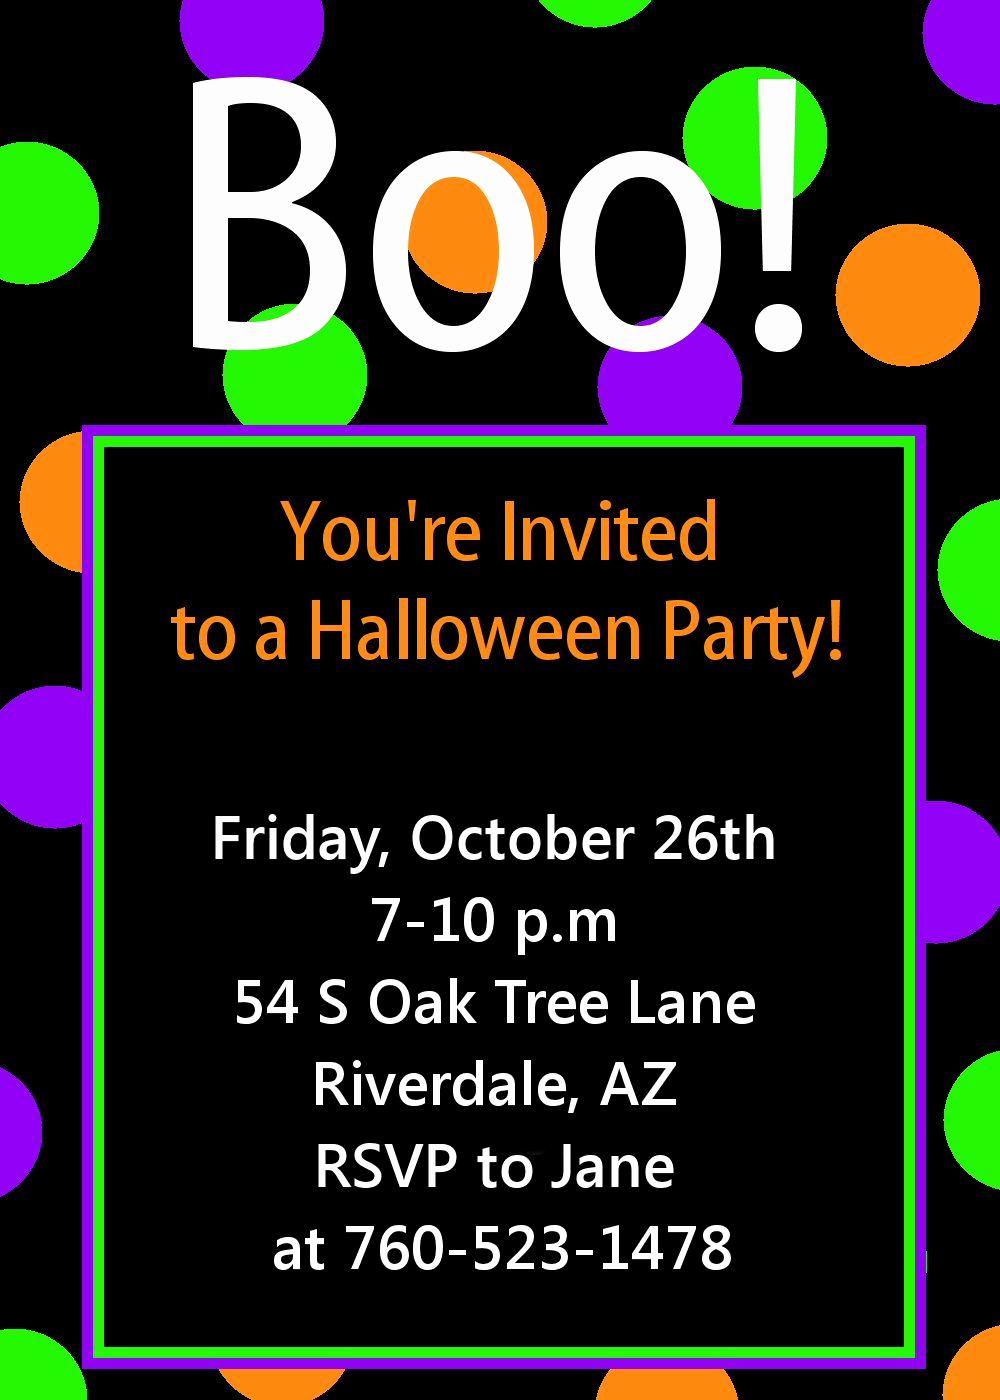 Halloween Party Invitations Templates New Halloween Party Invitation Printable